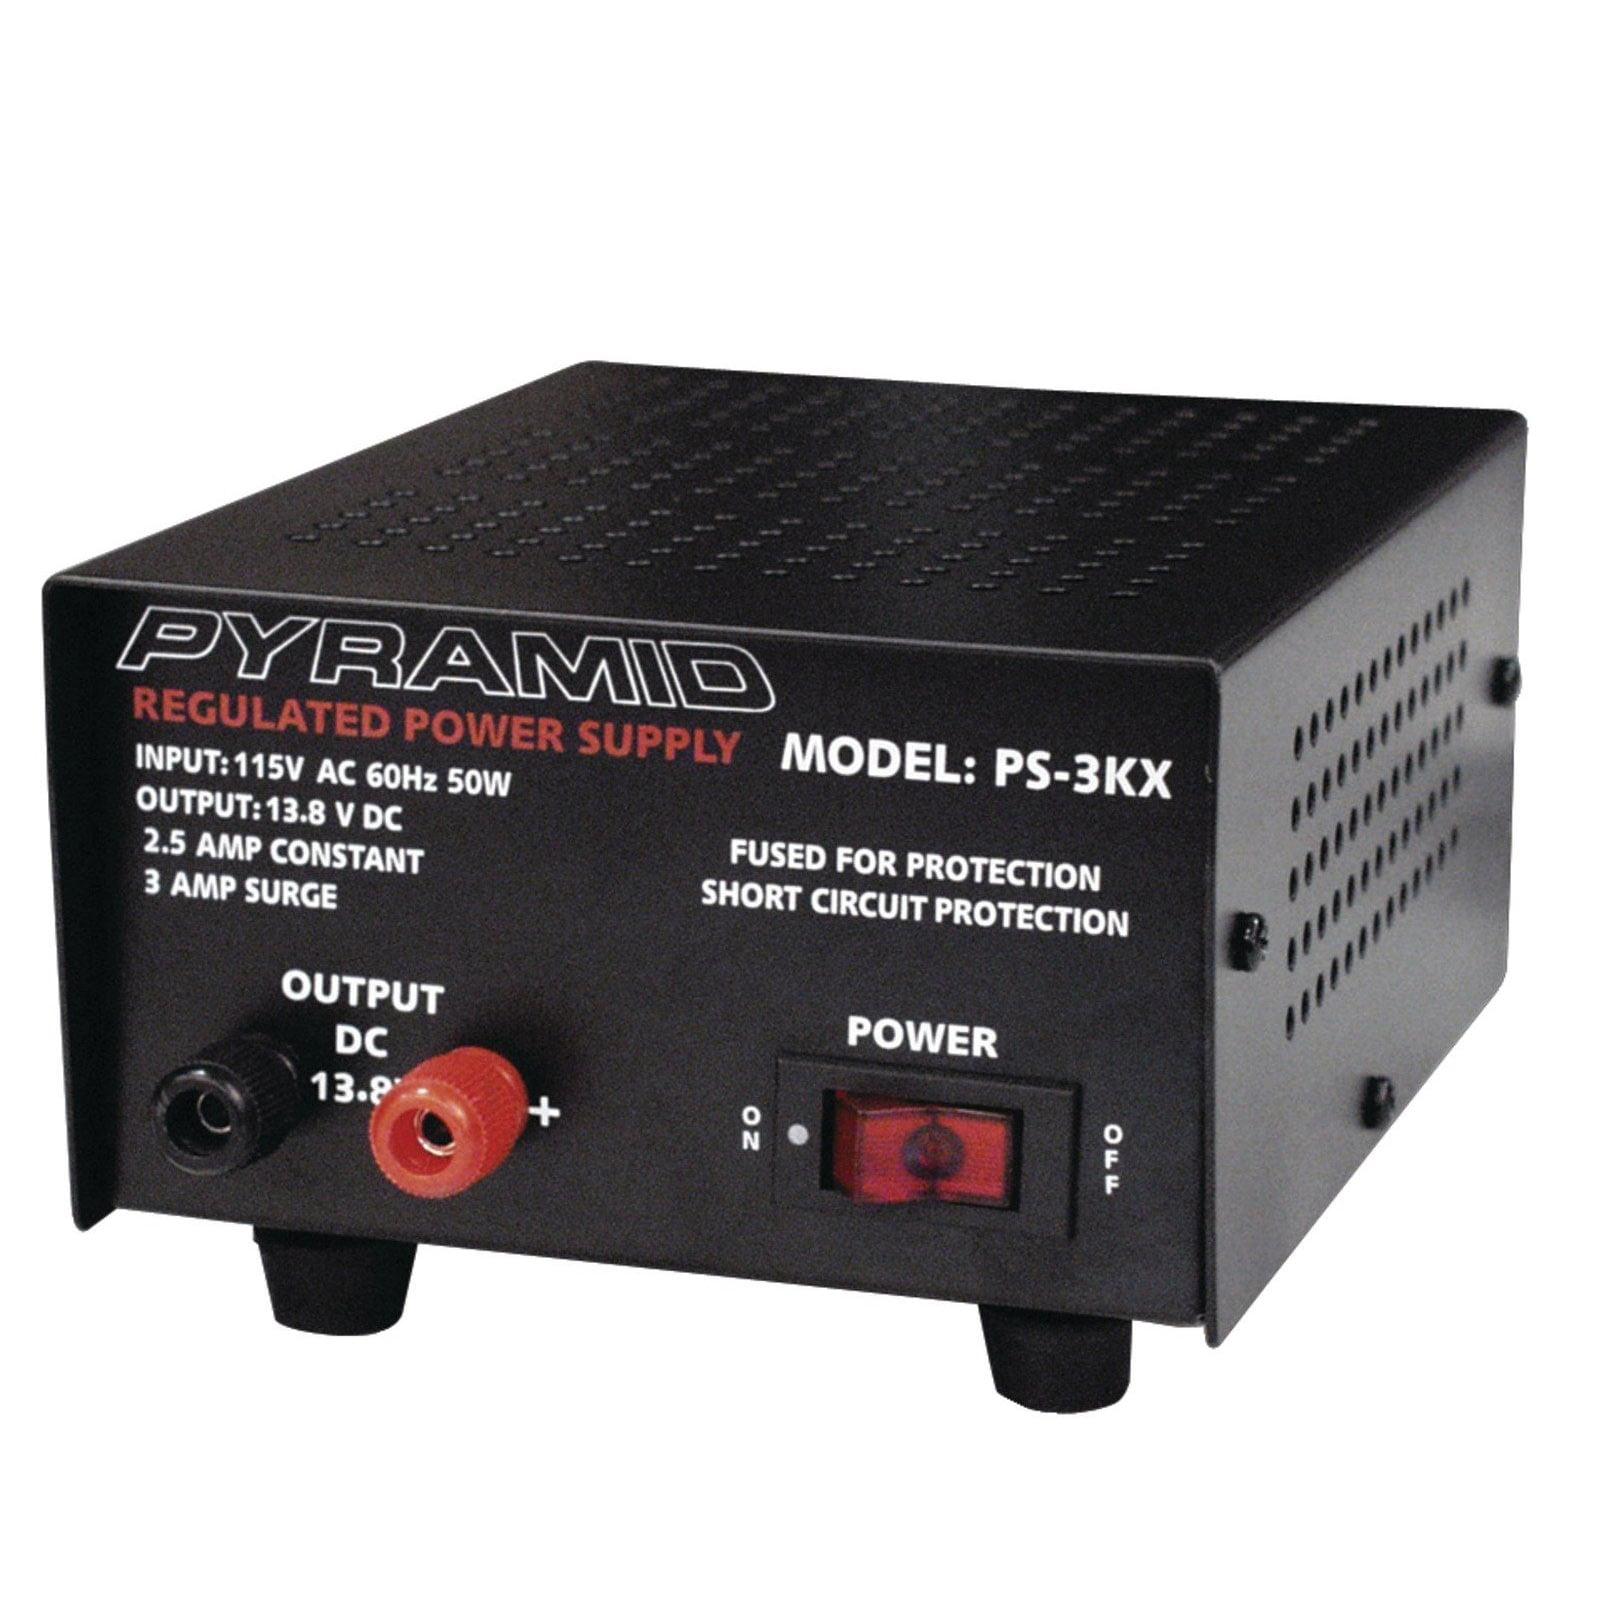 Pyramid 2.5 Amp Power Supply